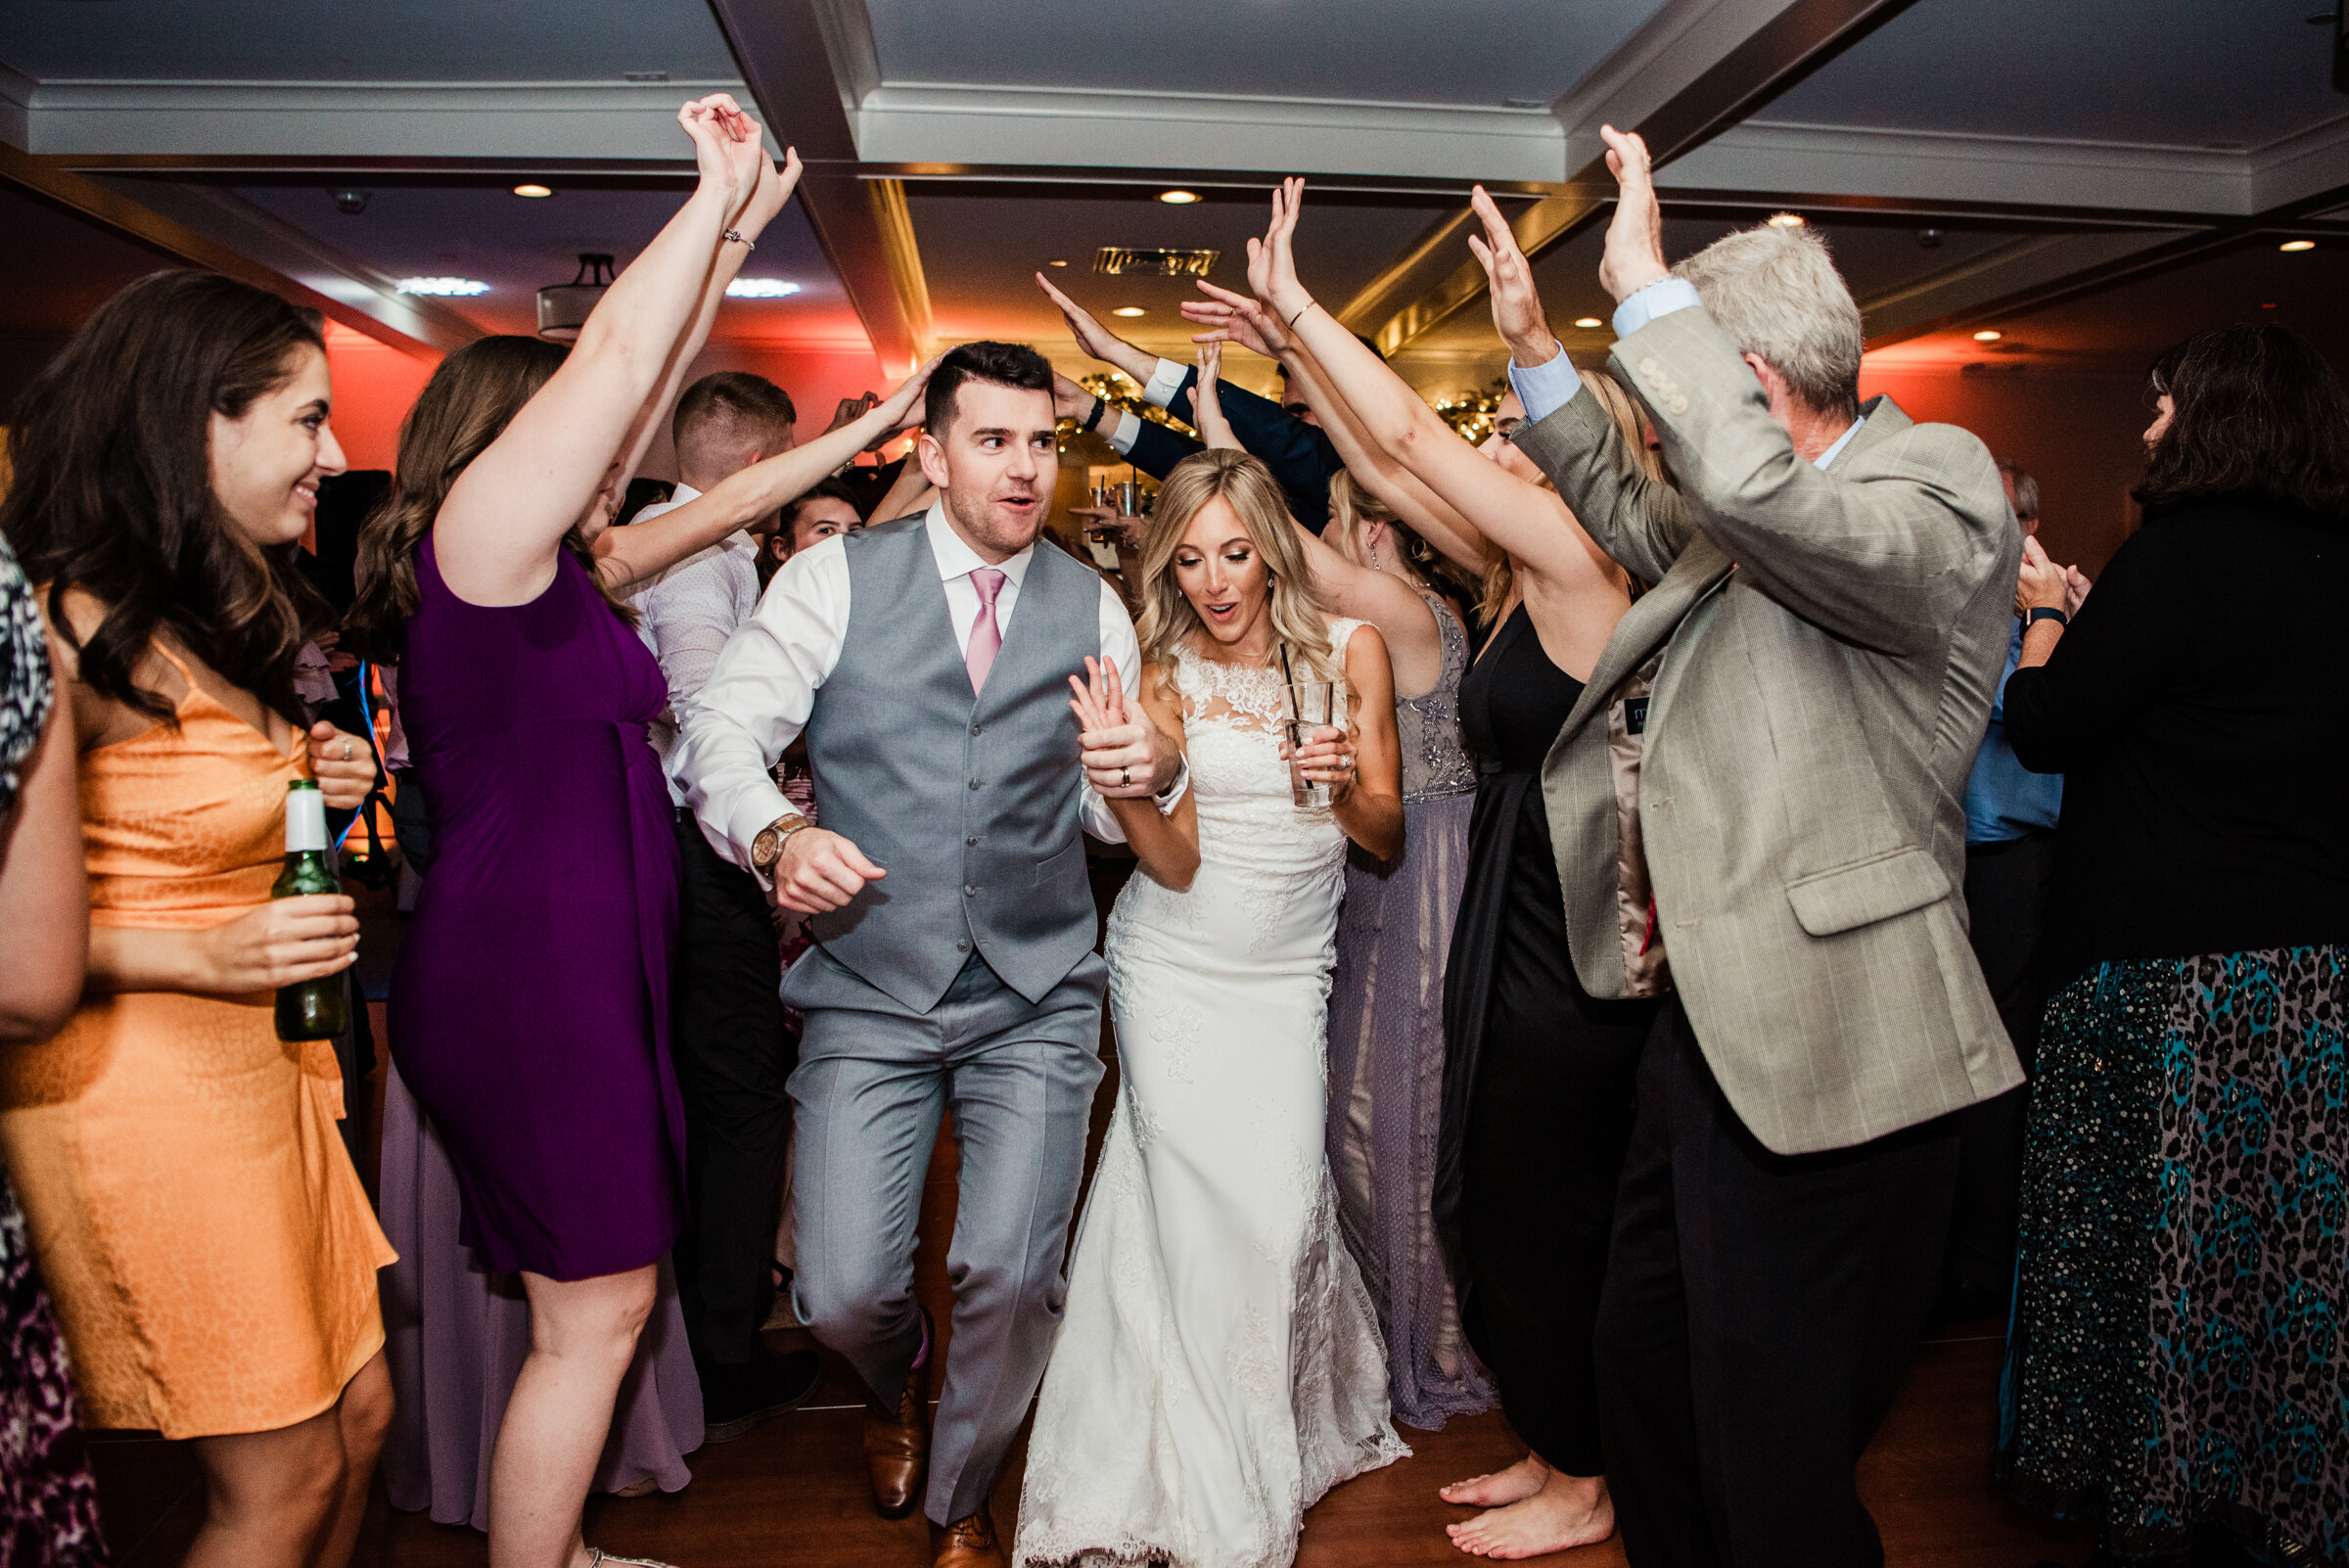 Deerfield_Country_Club_Rochester_Wedding_JILL_STUDIO_Rochester_NY_Photographer_DSC_7487.jpg